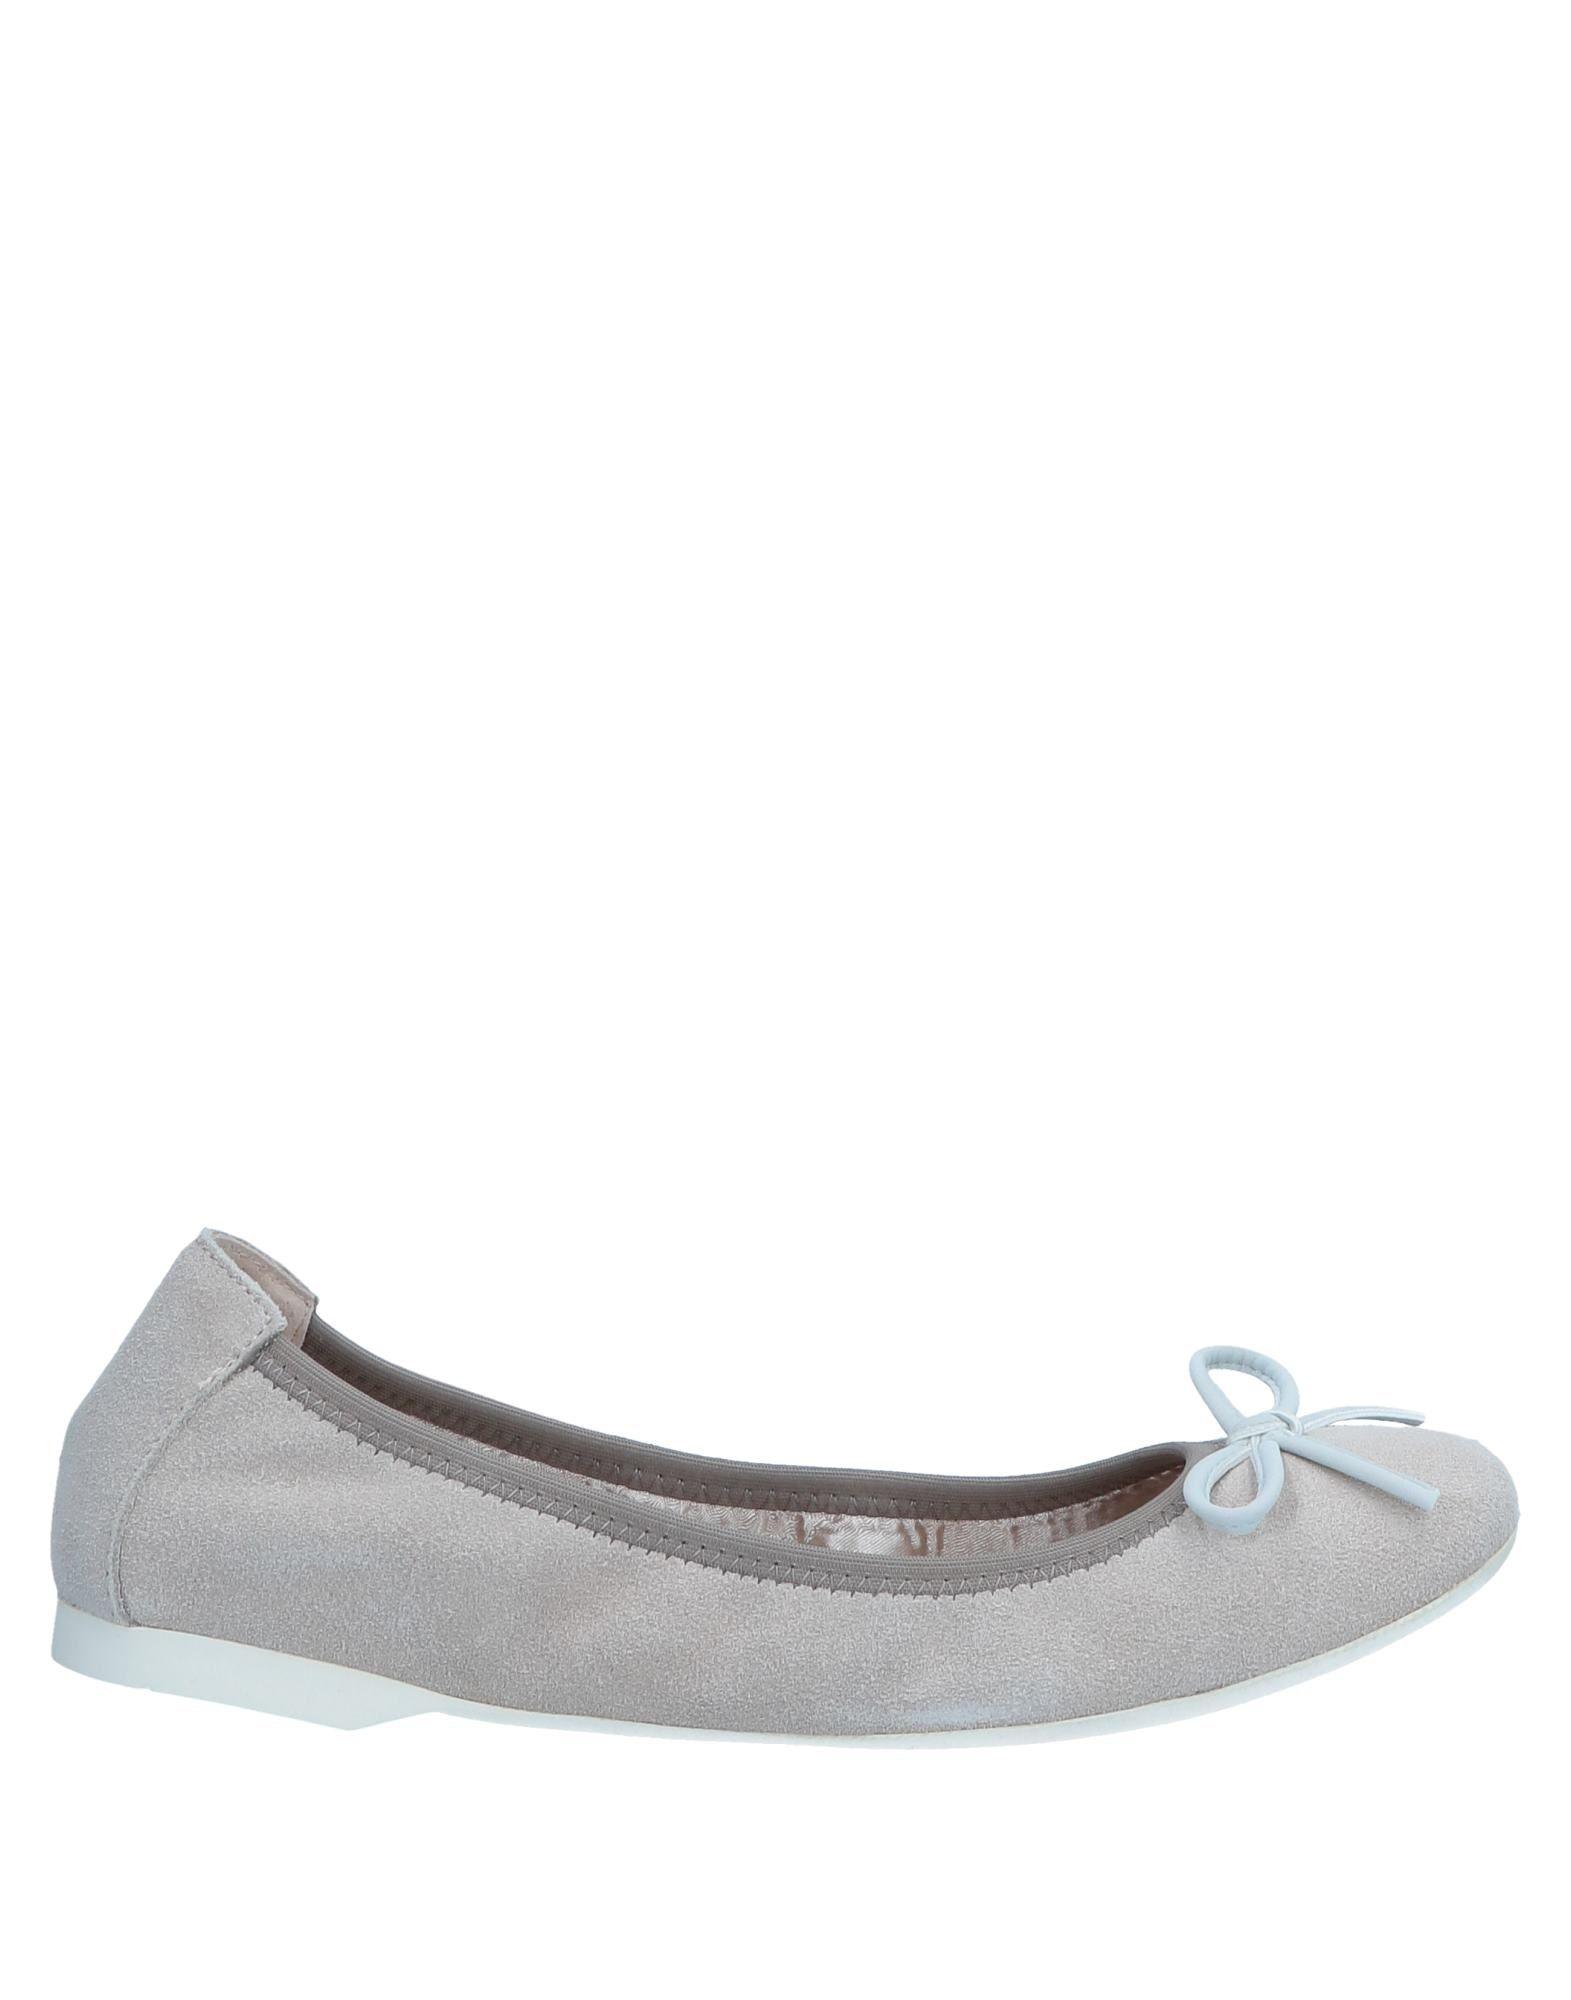 Cafènoir Ballet Flats - Women on Cafènoir Ballet Flats online on Women  Australia - 11558742KT 98bea9